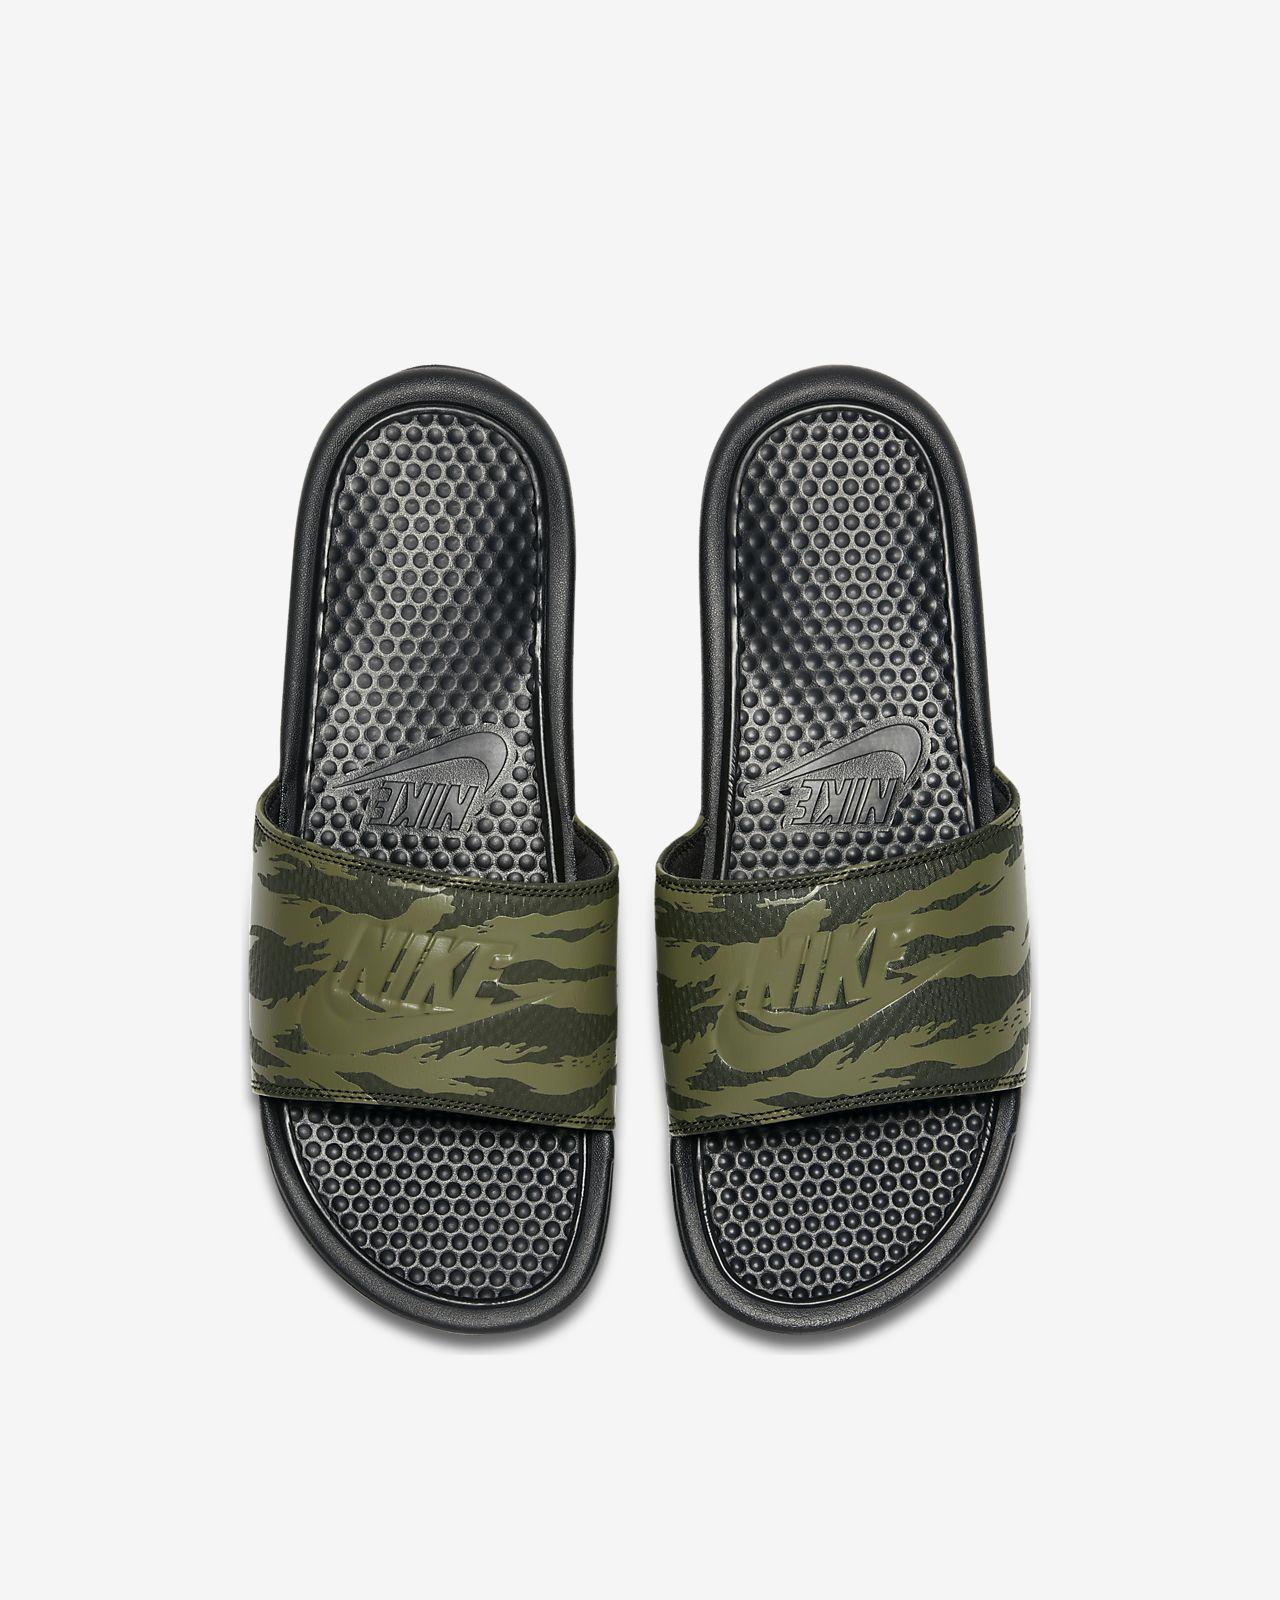 on sale 6aff1 a9ce2 ... Claquette Nike Benassi JDI pour Homme